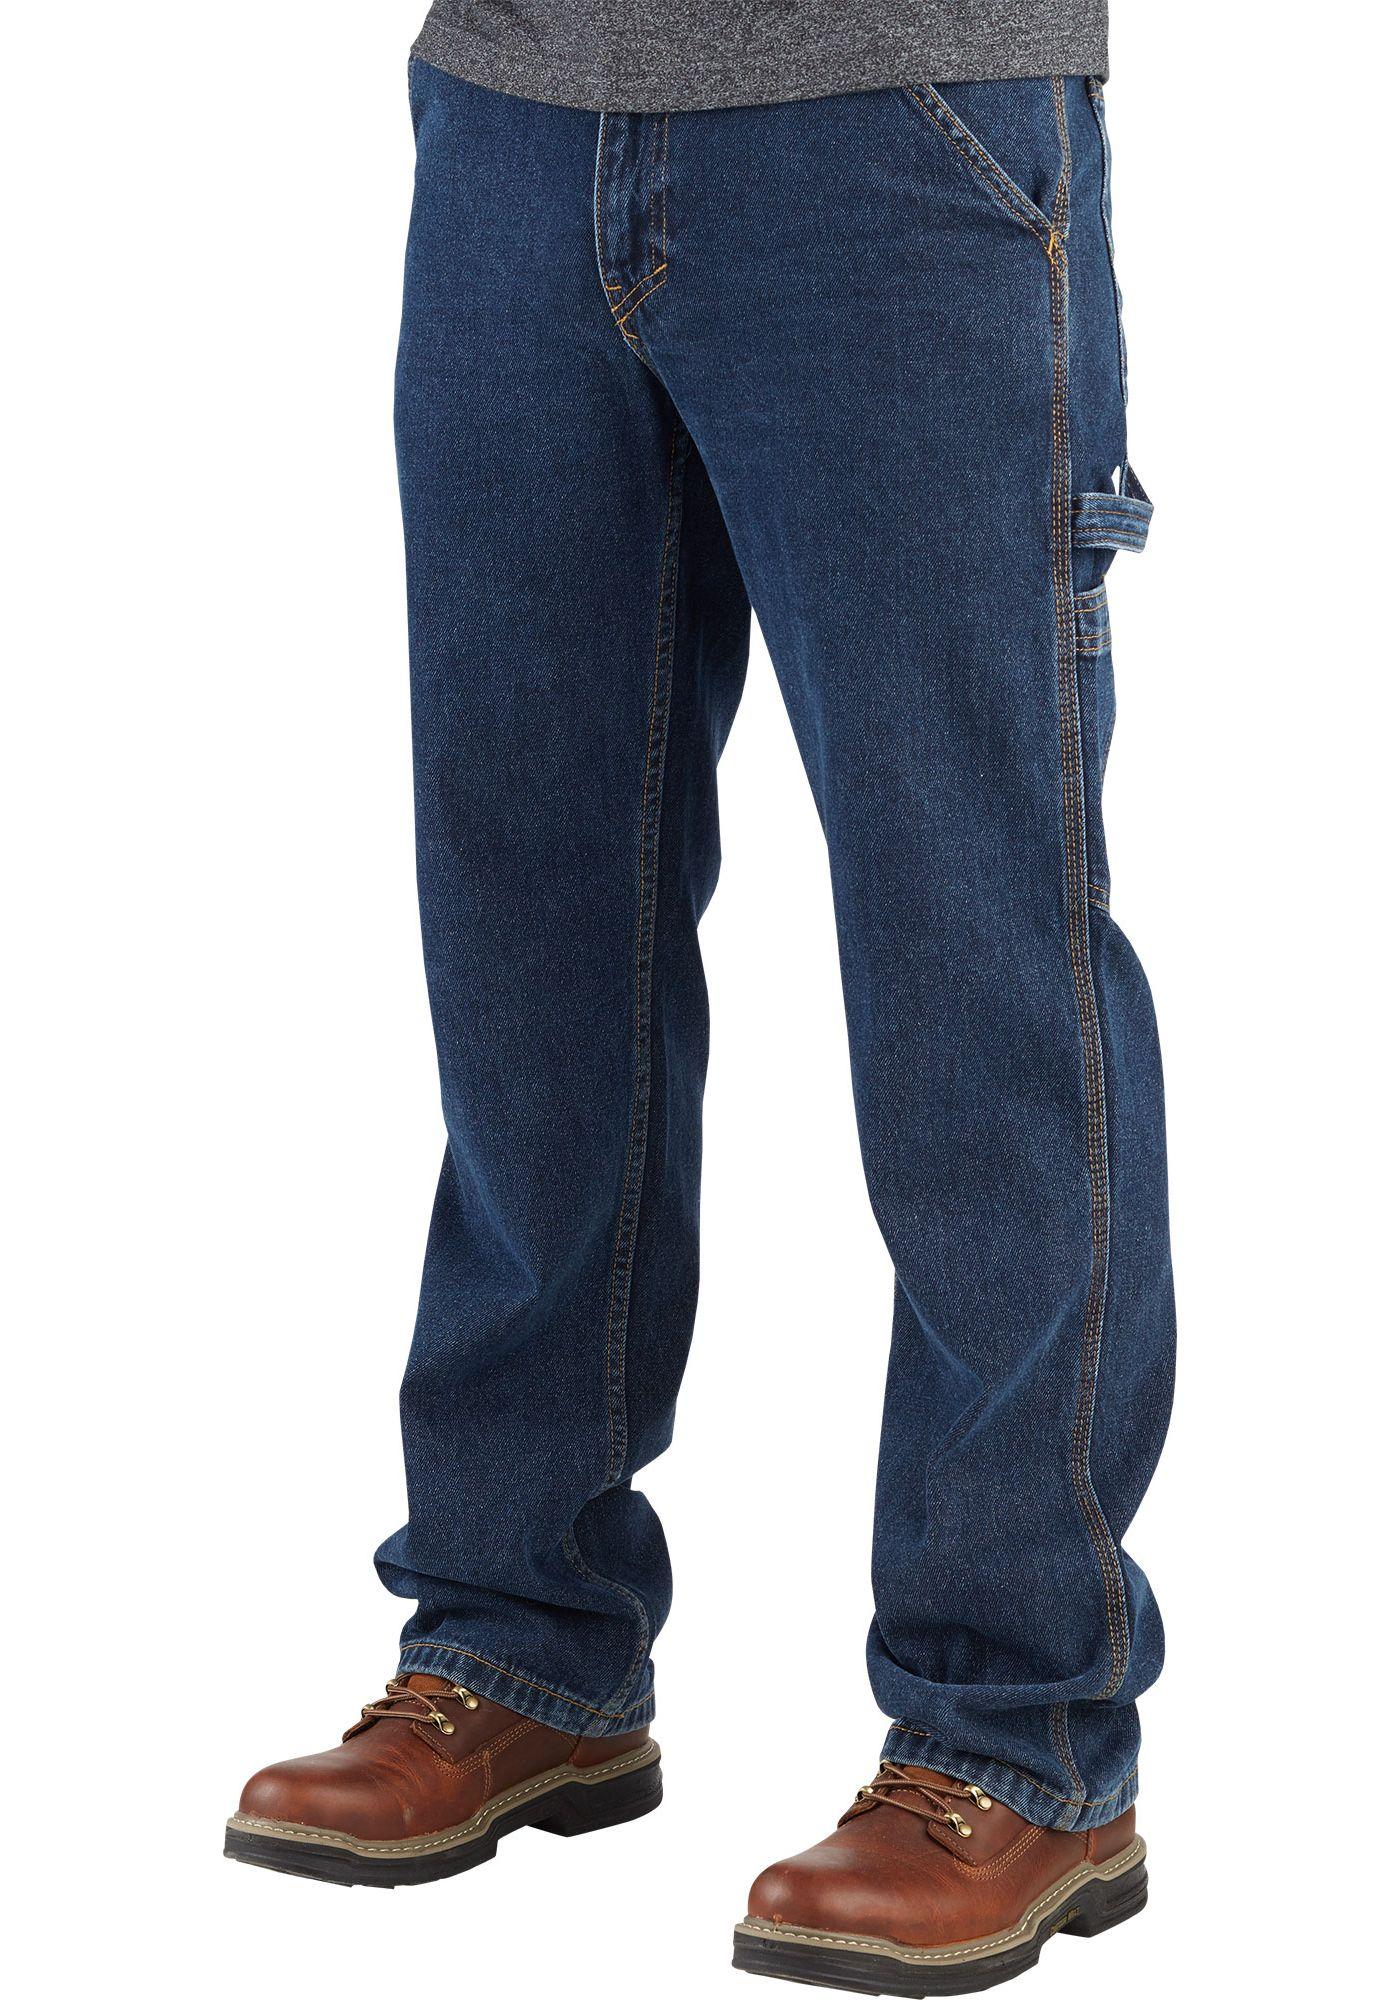 Wolverine Men's Hammer Loop Pants (Regular and Big & Tall)